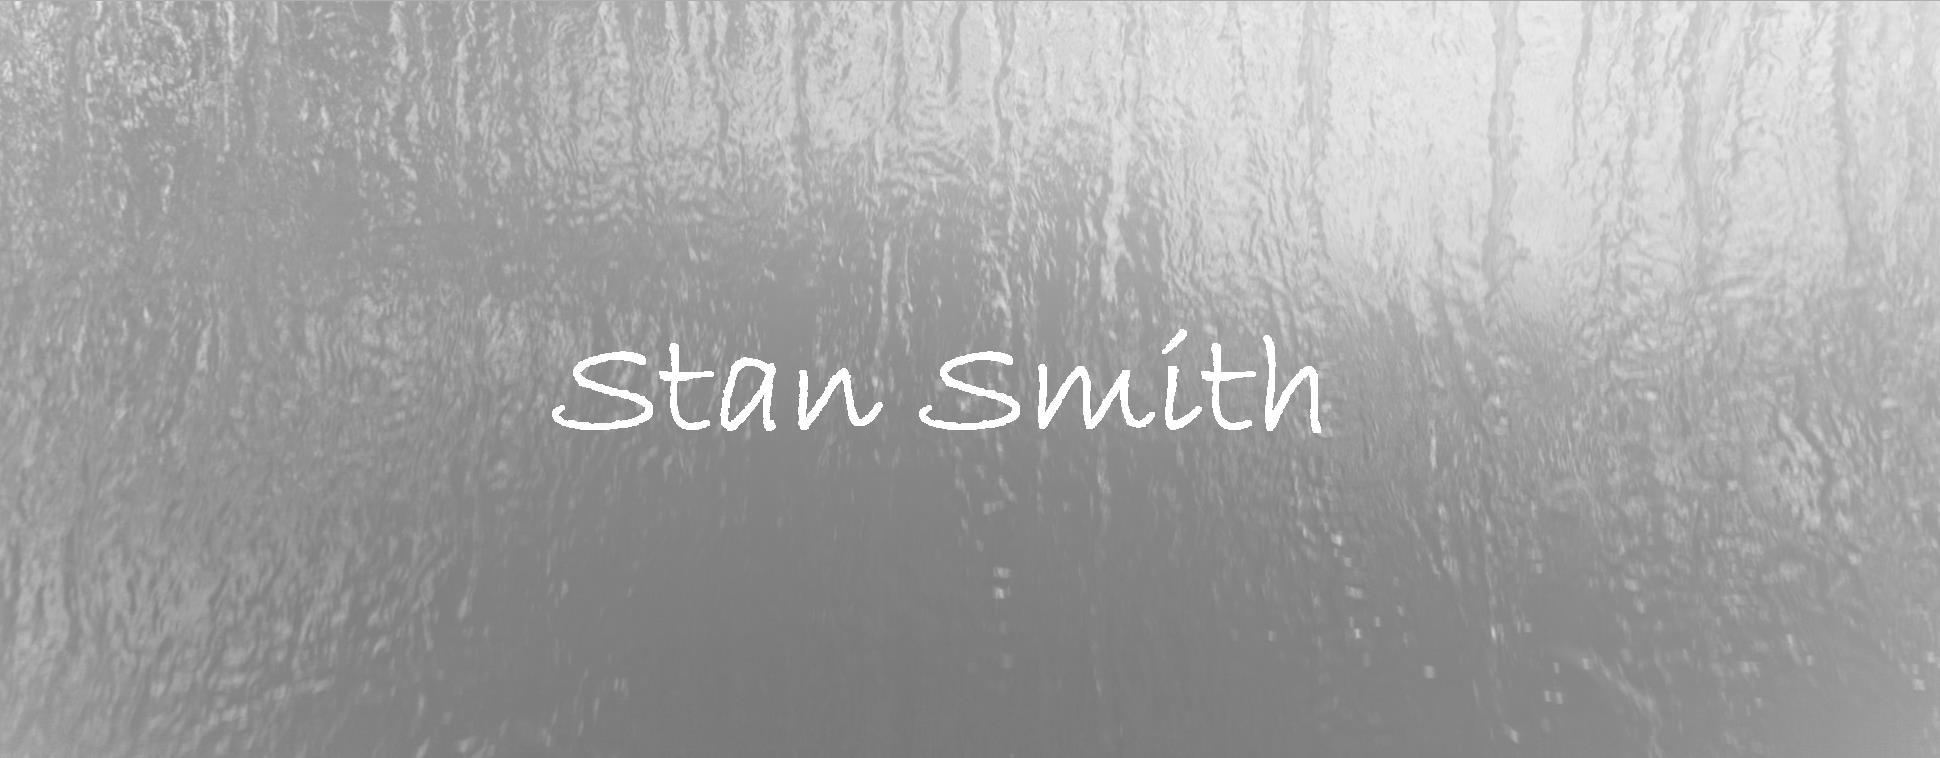 Stan Smith.jpg